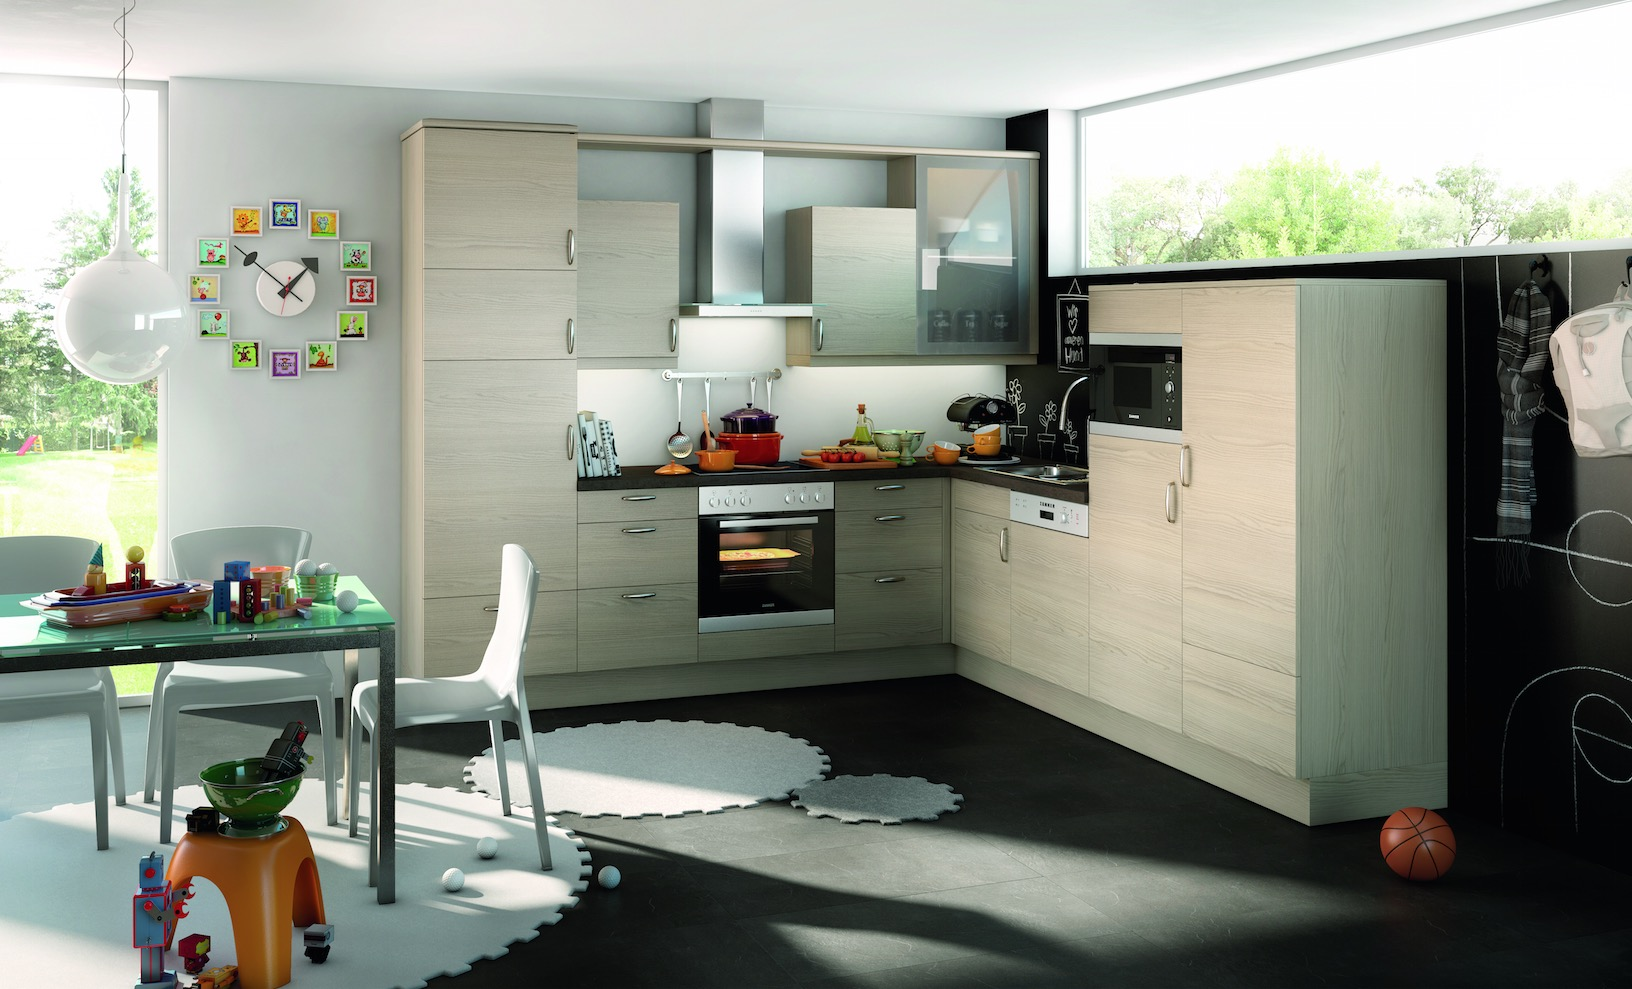 madeia wesfa sch ller k chen luxusk che online nolte k che page 6. Black Bedroom Furniture Sets. Home Design Ideas